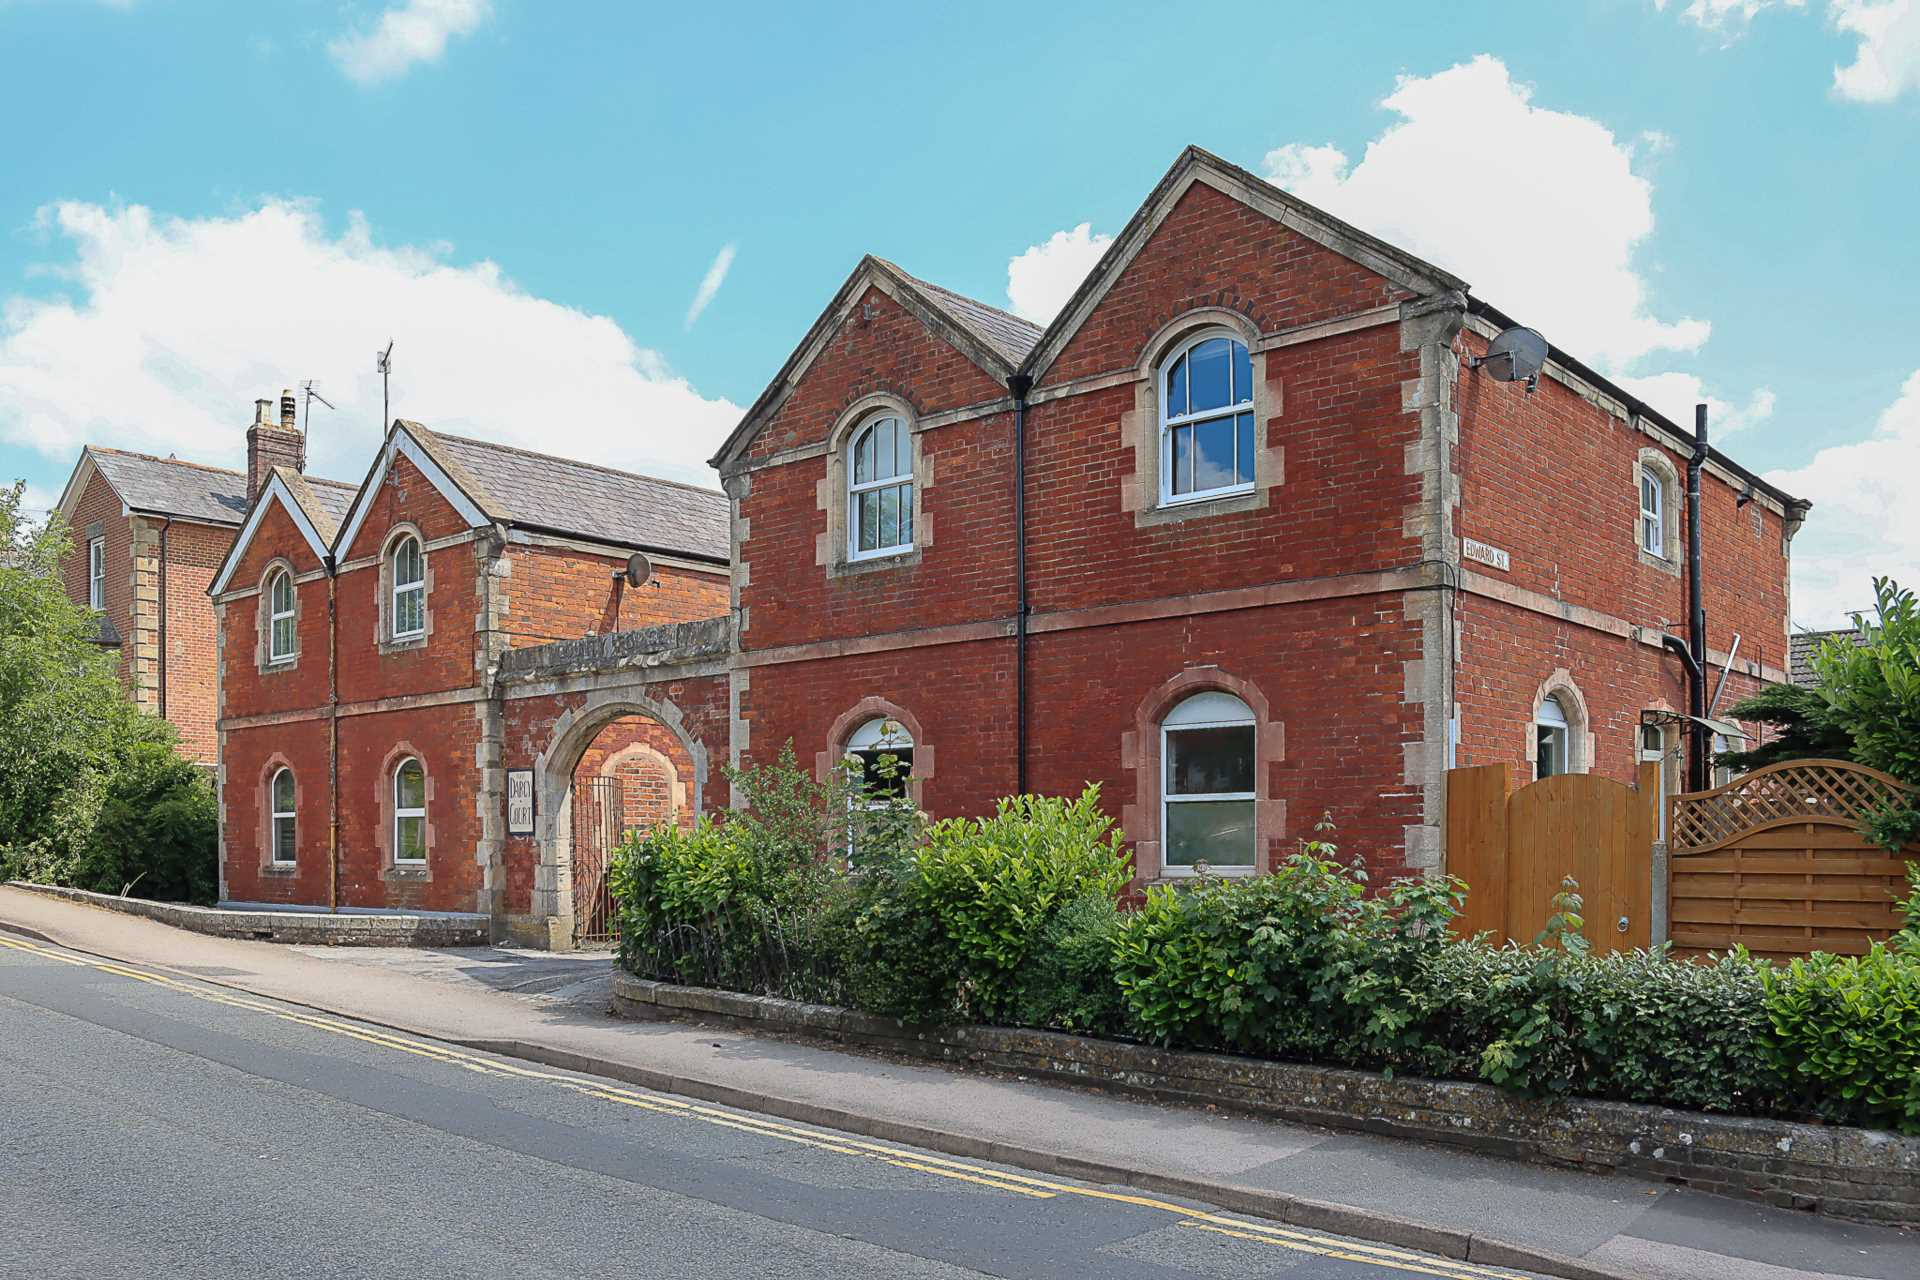 2 bed flat for sale in Darcy Court, Salisbury Road, Blandford Forum, Blandford Forum 0